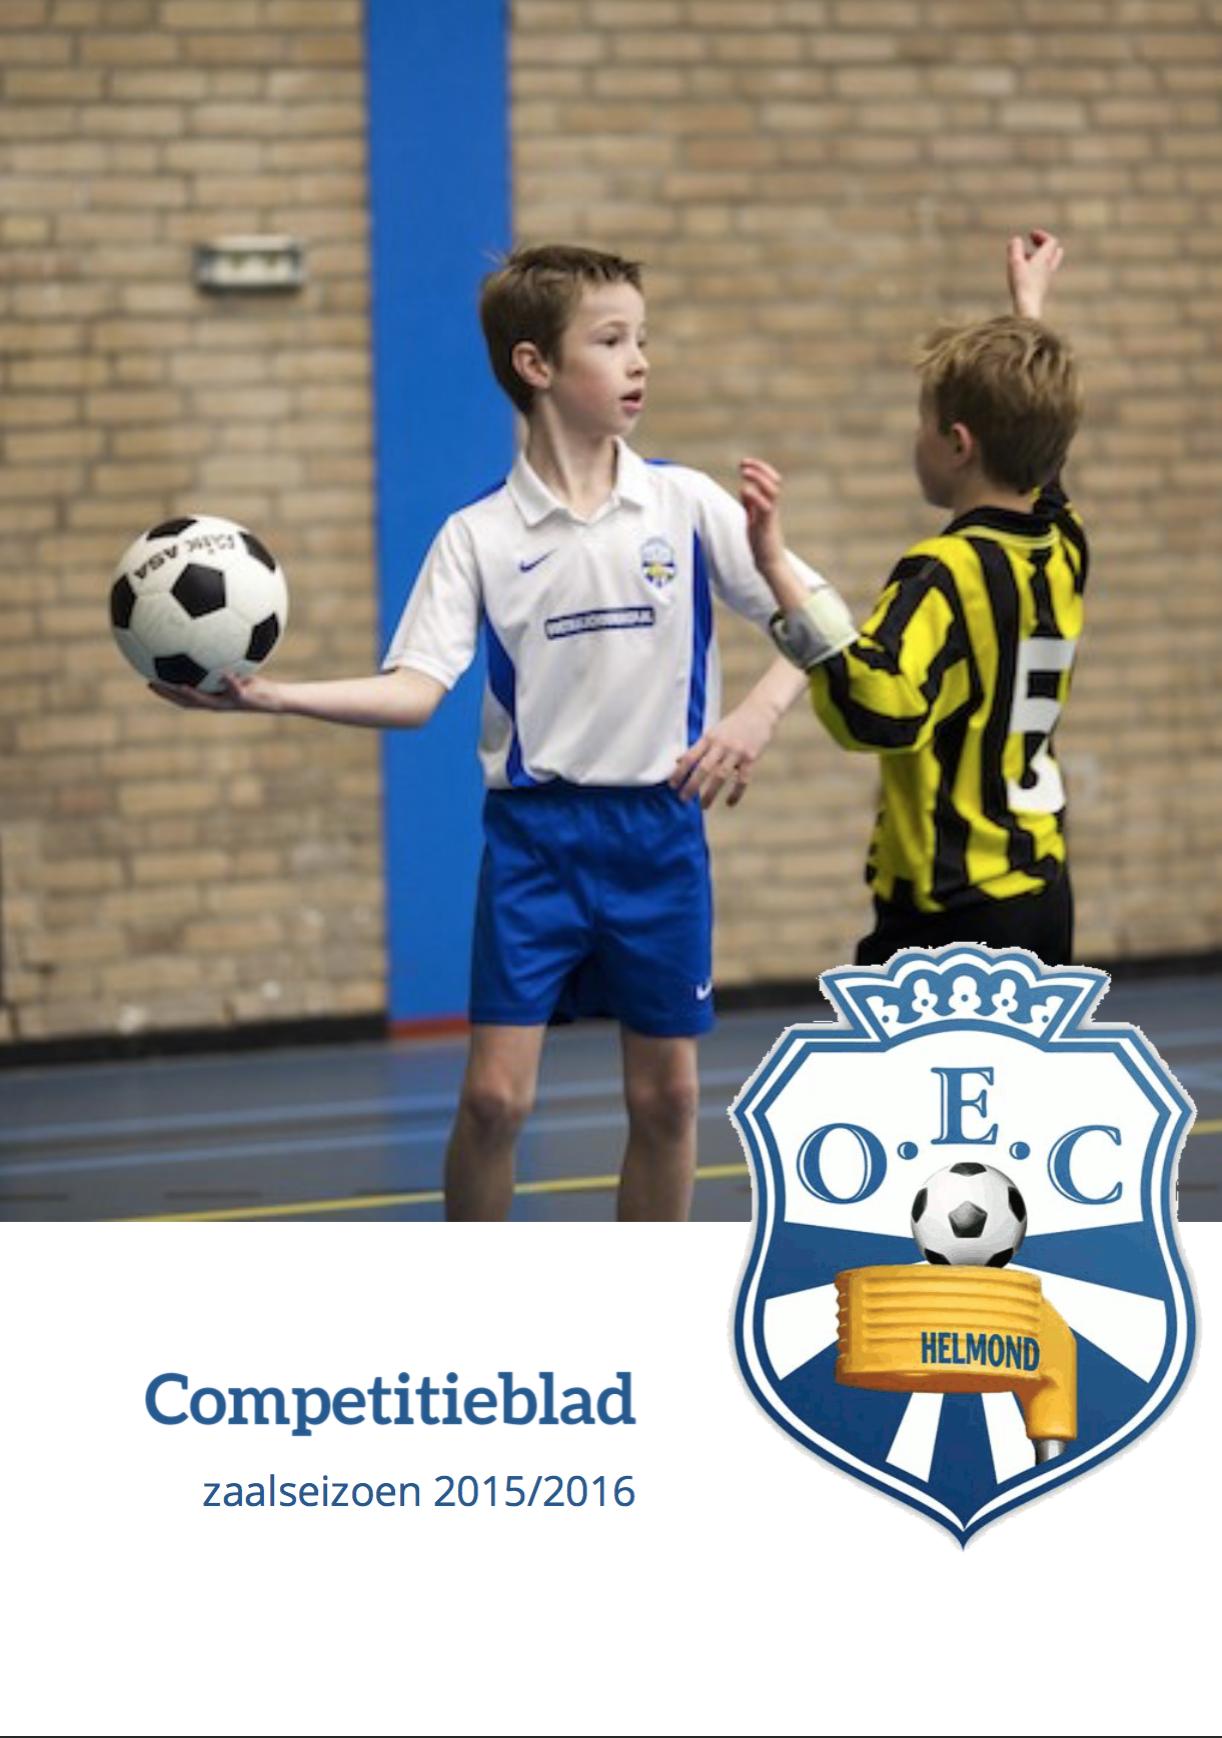 Competitieblad Zaal 2015/2016